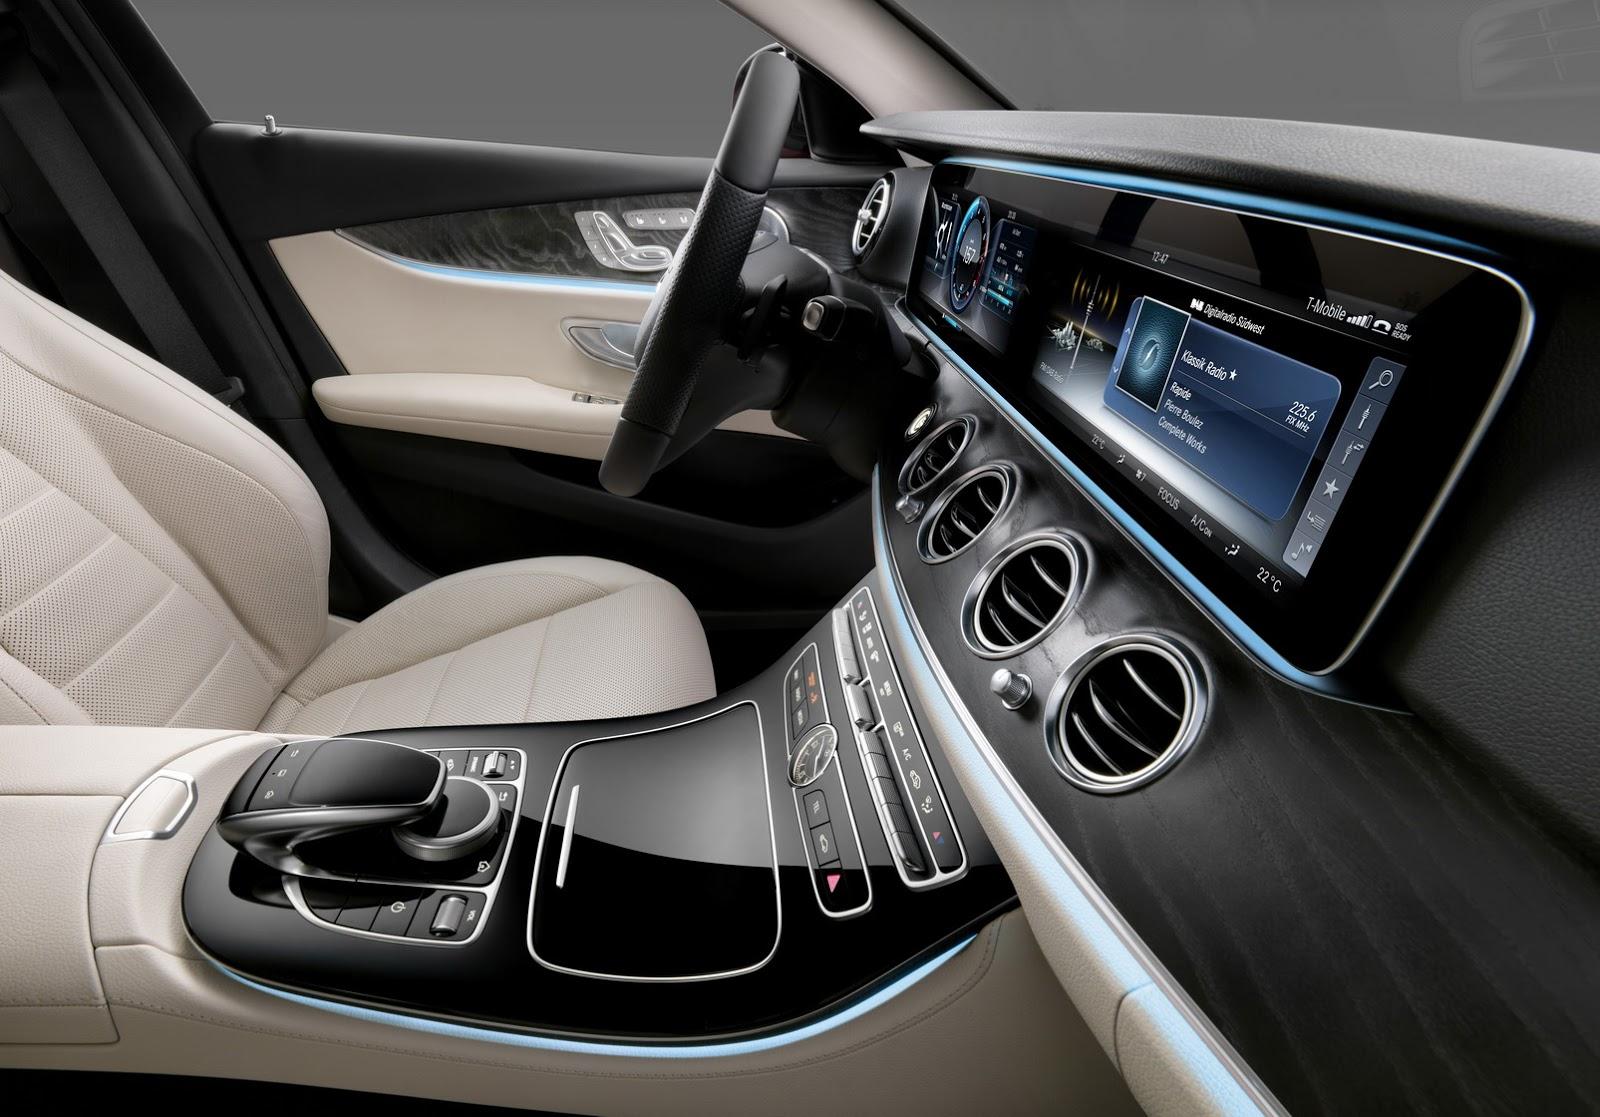 2017 mercedes e class interior carscoops5 flatout 2017 mercedes e class interior carscoops5 stopboris Images